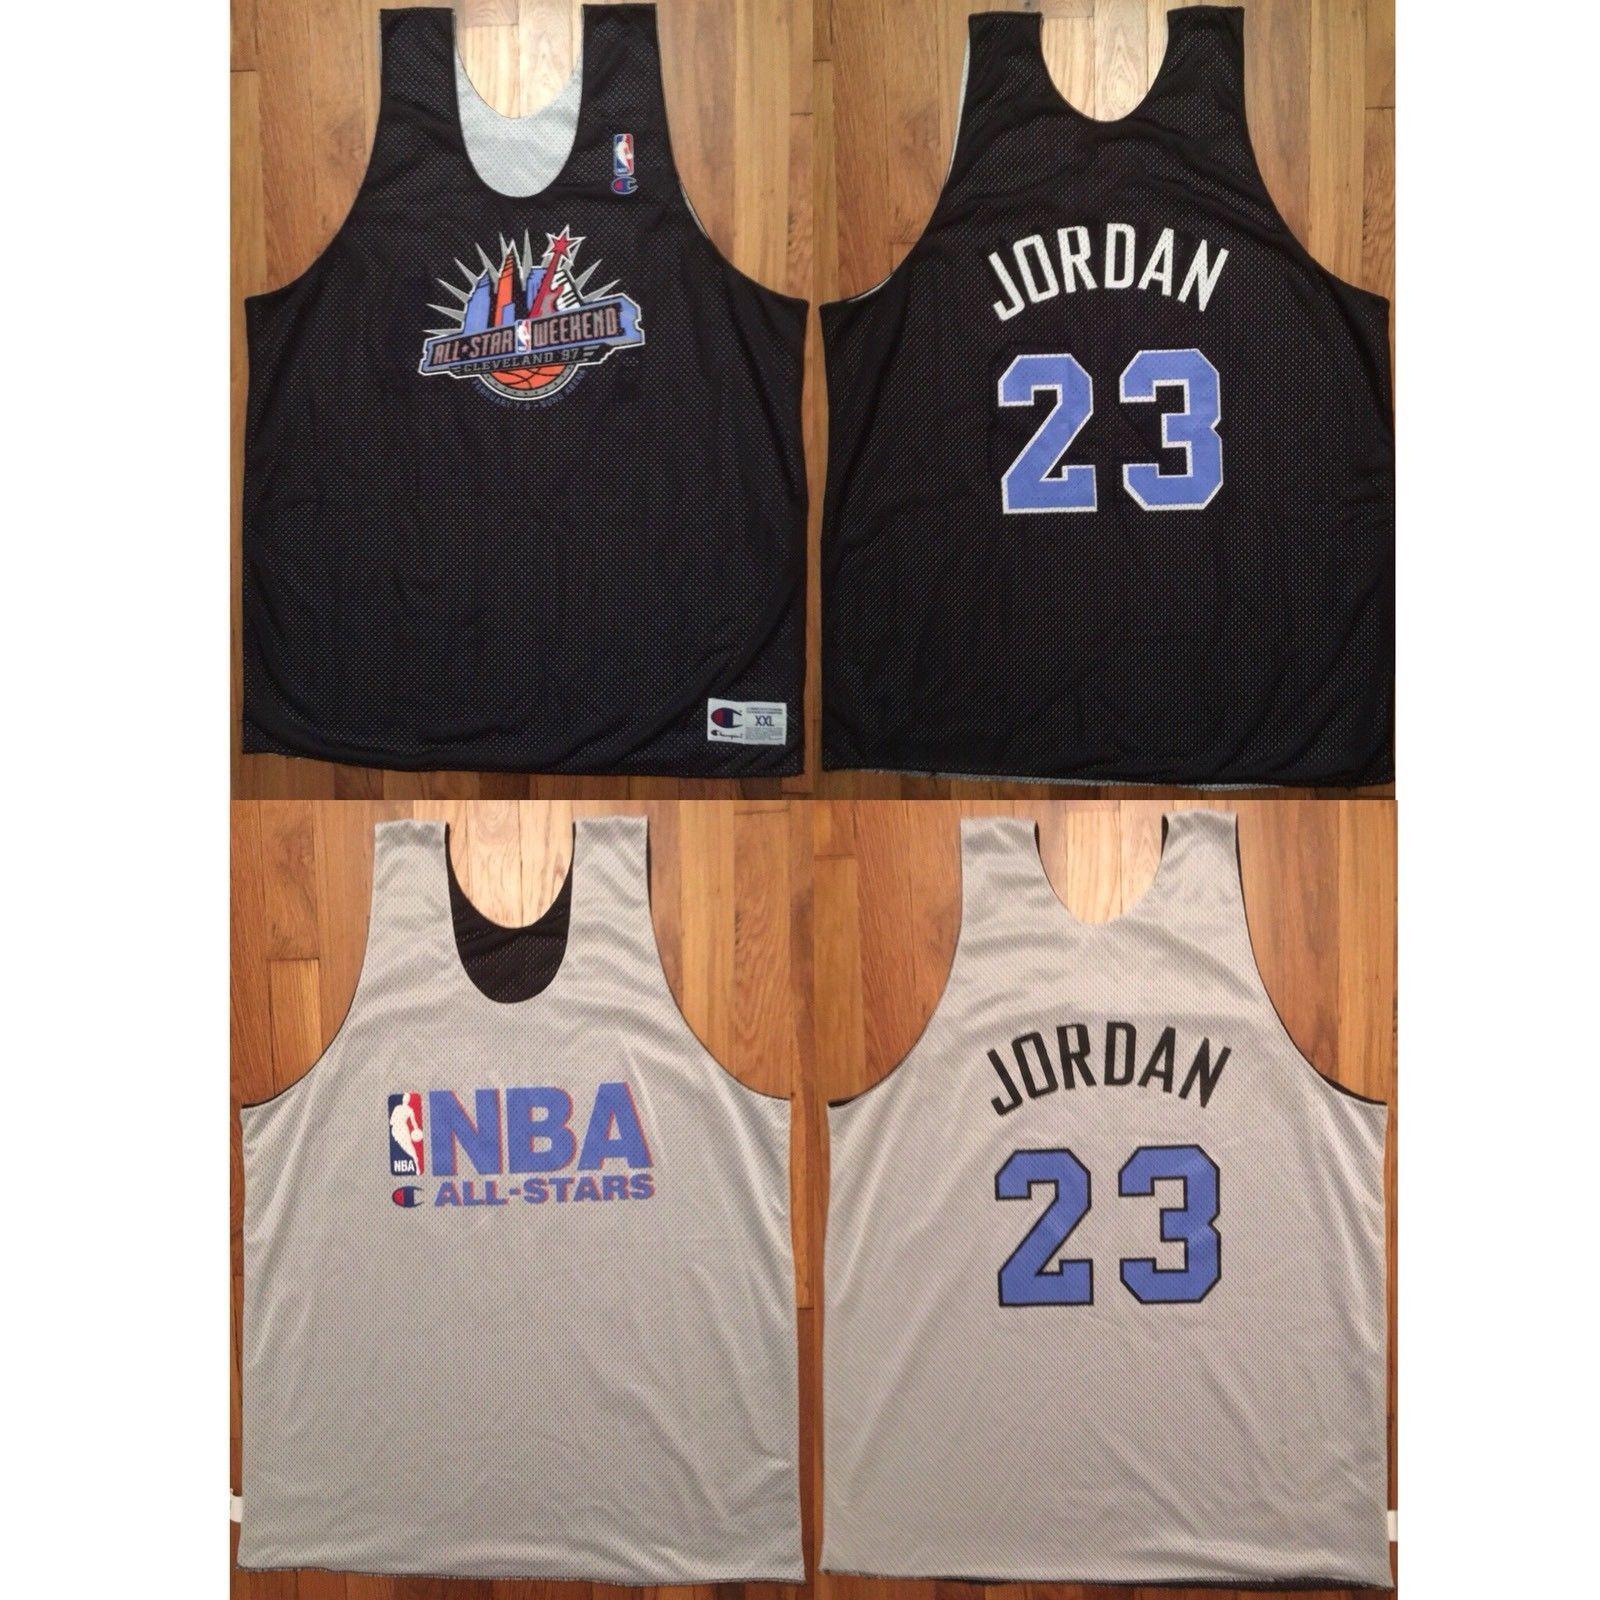 new arrival 10ea2 4d324 1997 NBA All-Star Chicago Bulls Michael and similar items